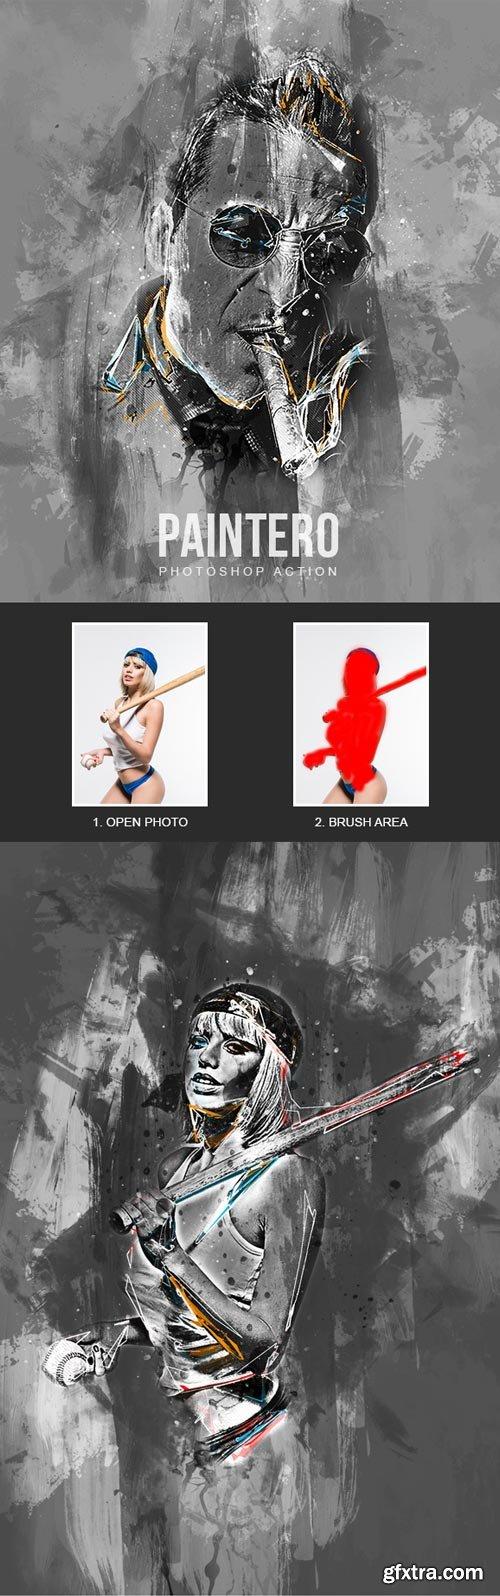 GraphicRiver - Paintero - Photoshop Action - 22196660